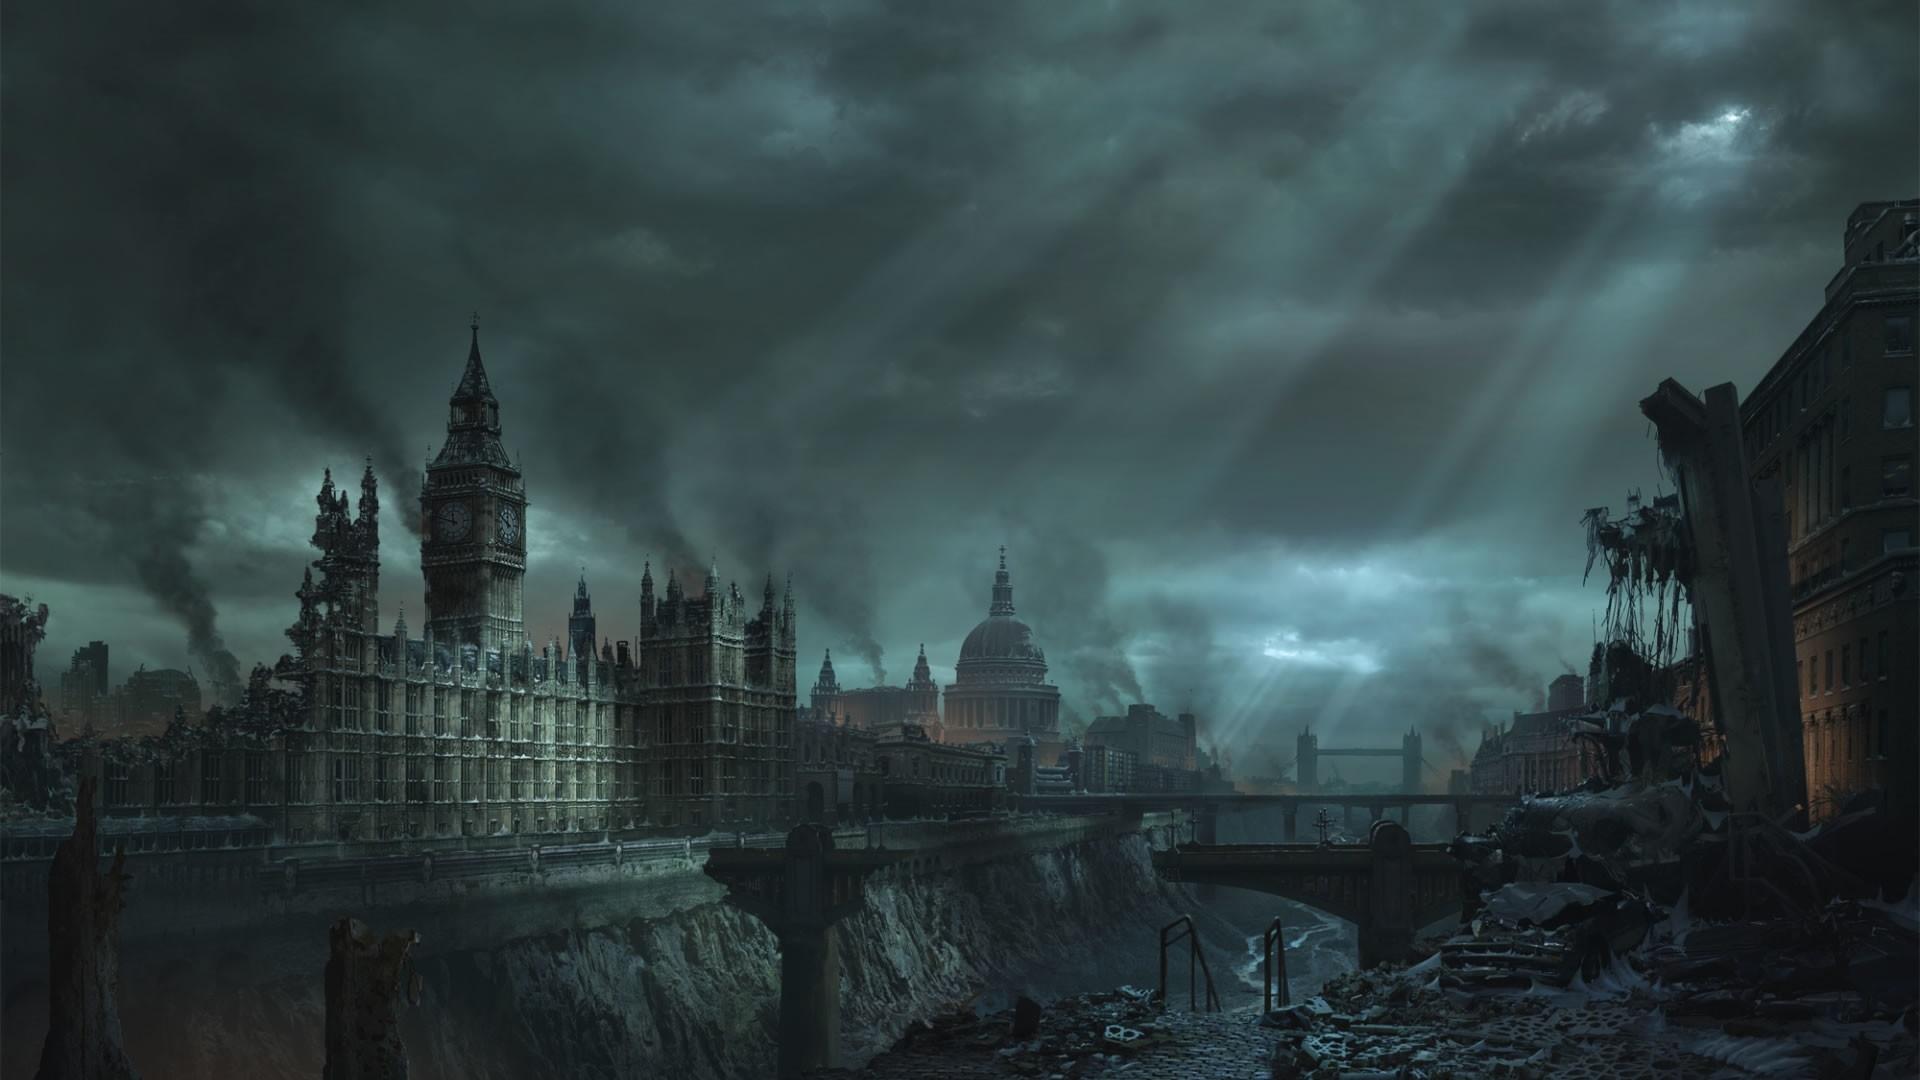 Apocaliptic London cityscape wallpaper